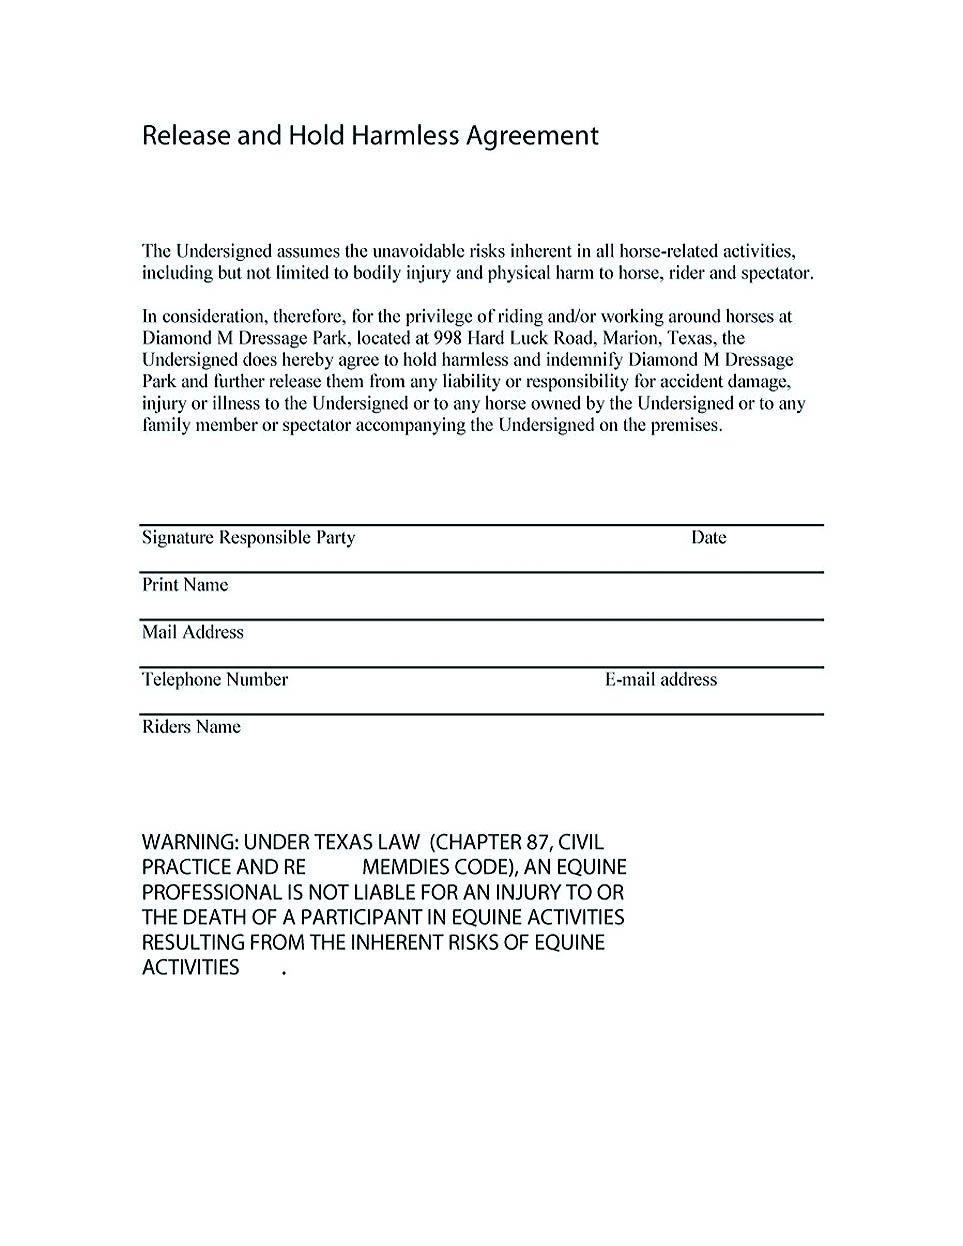 Hold Harmless Agreement Sample Wording Making Hold